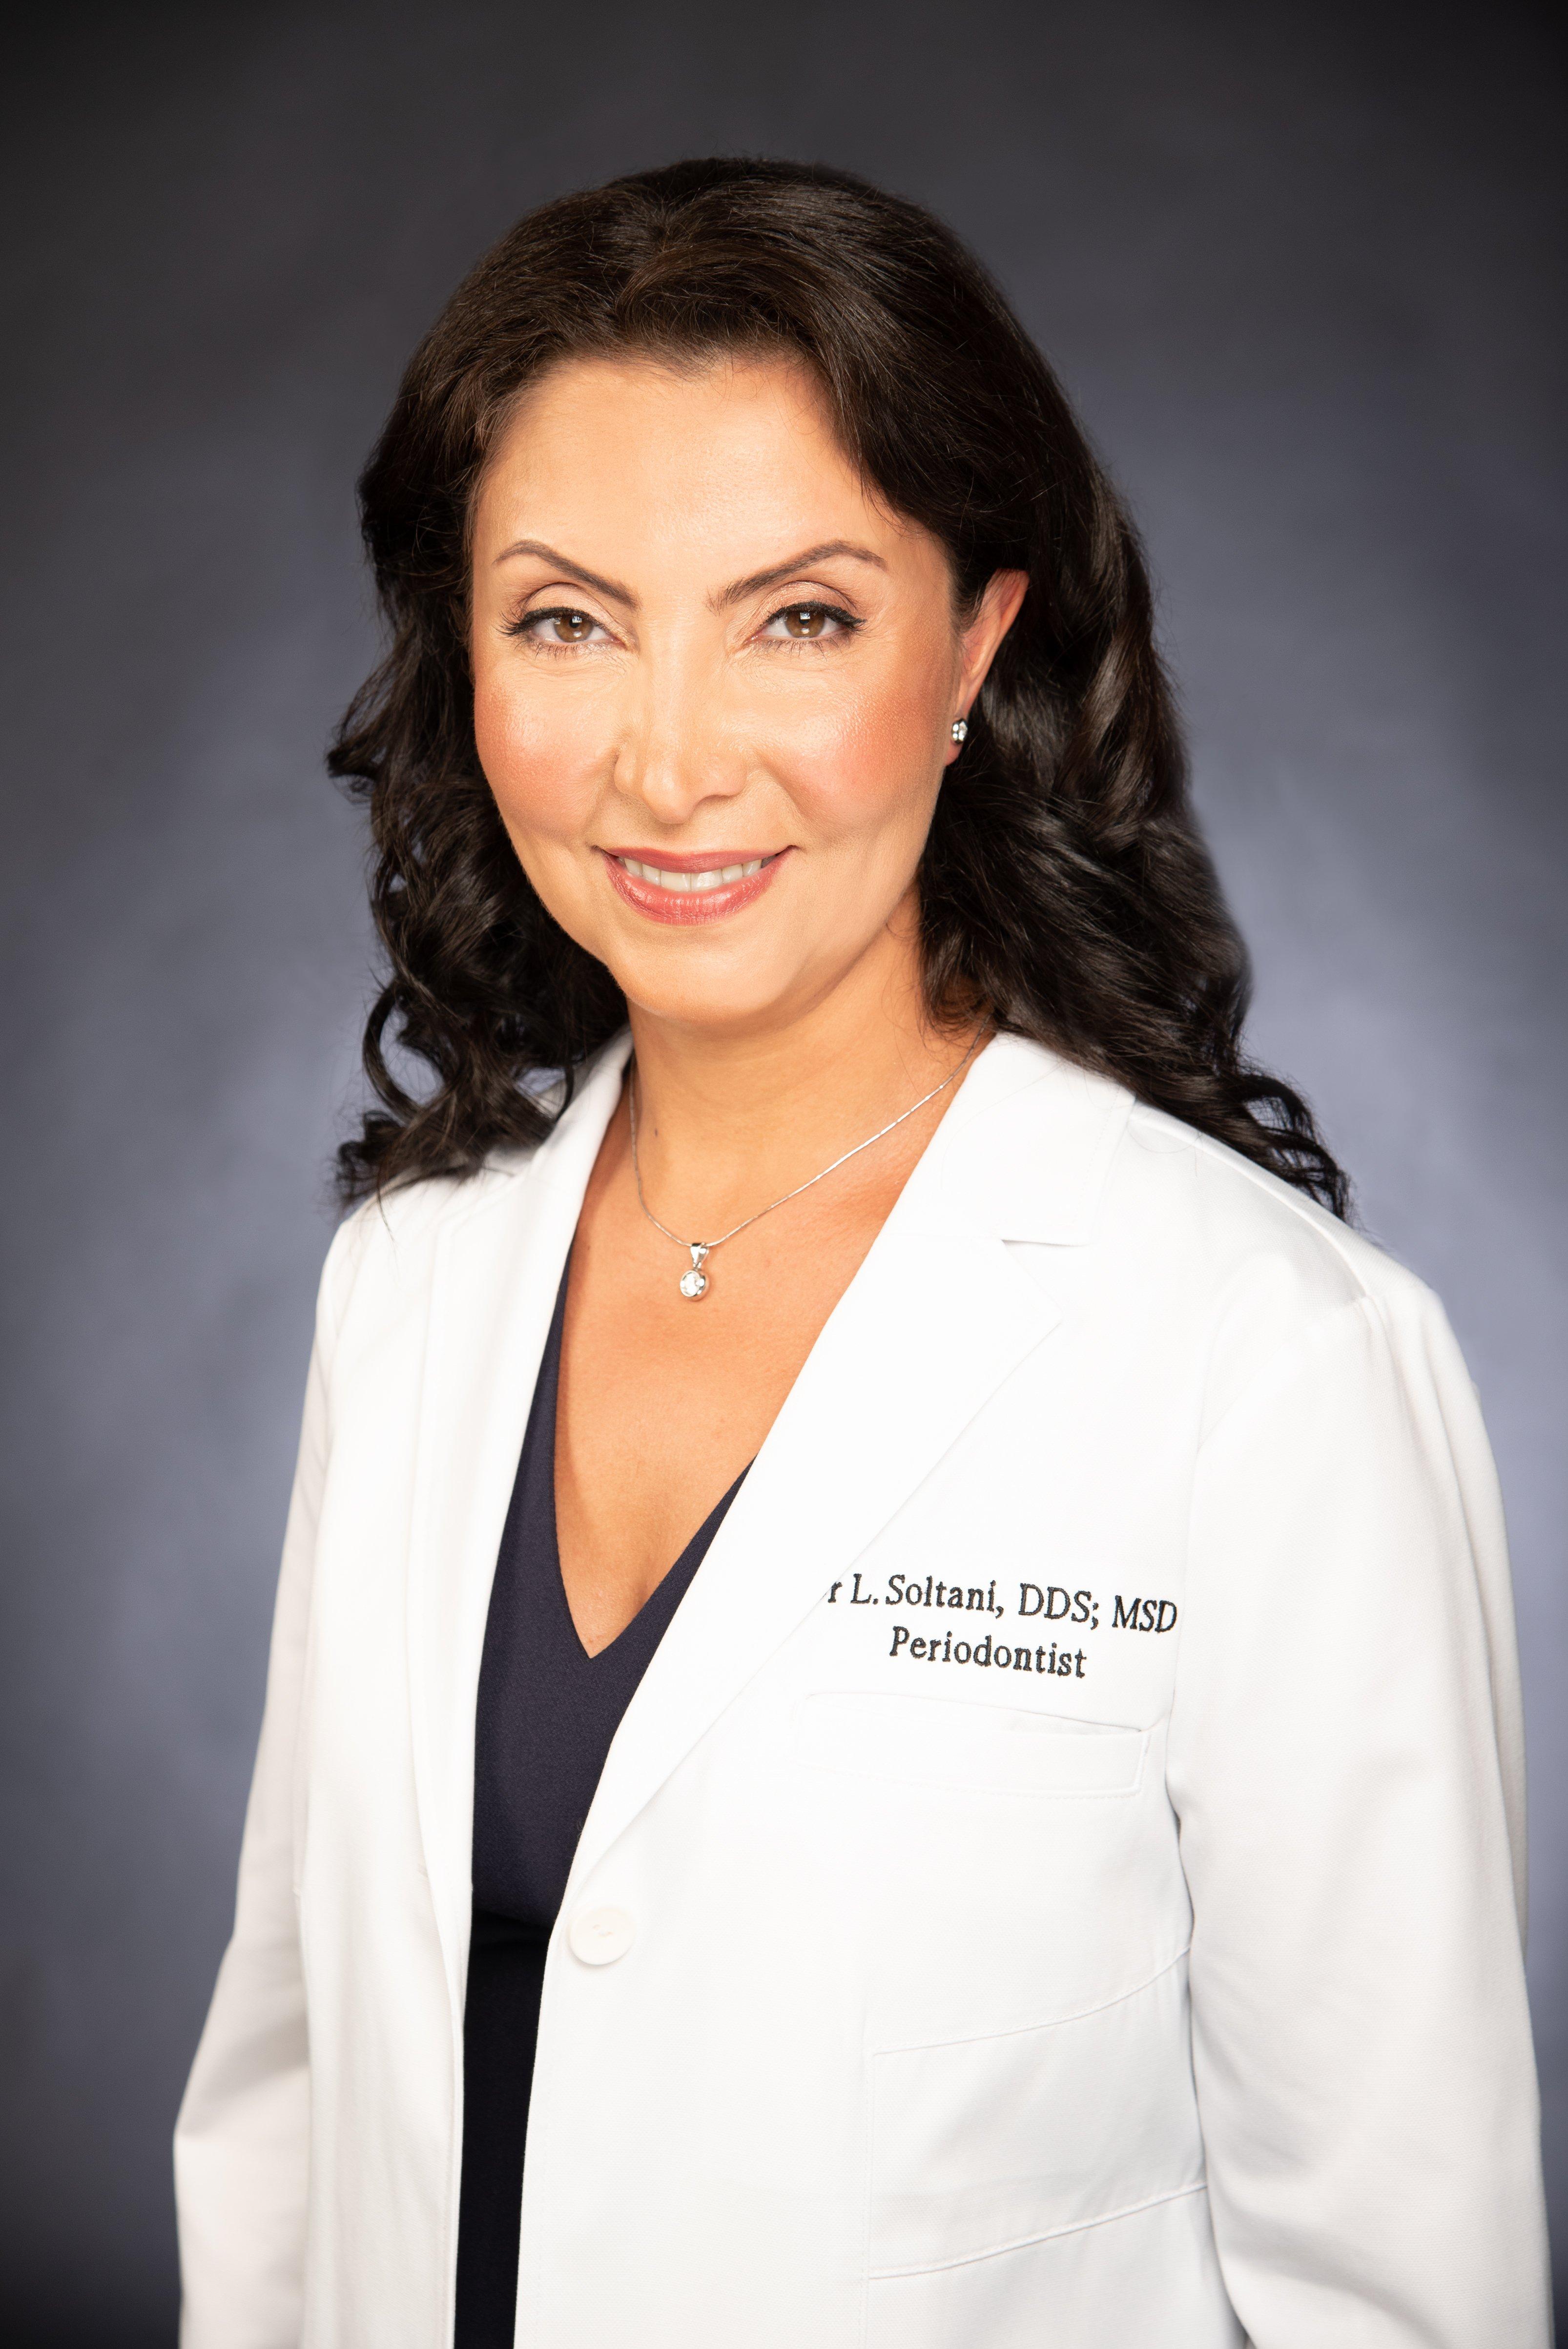 Dr. Leila Soltani DDS MSD